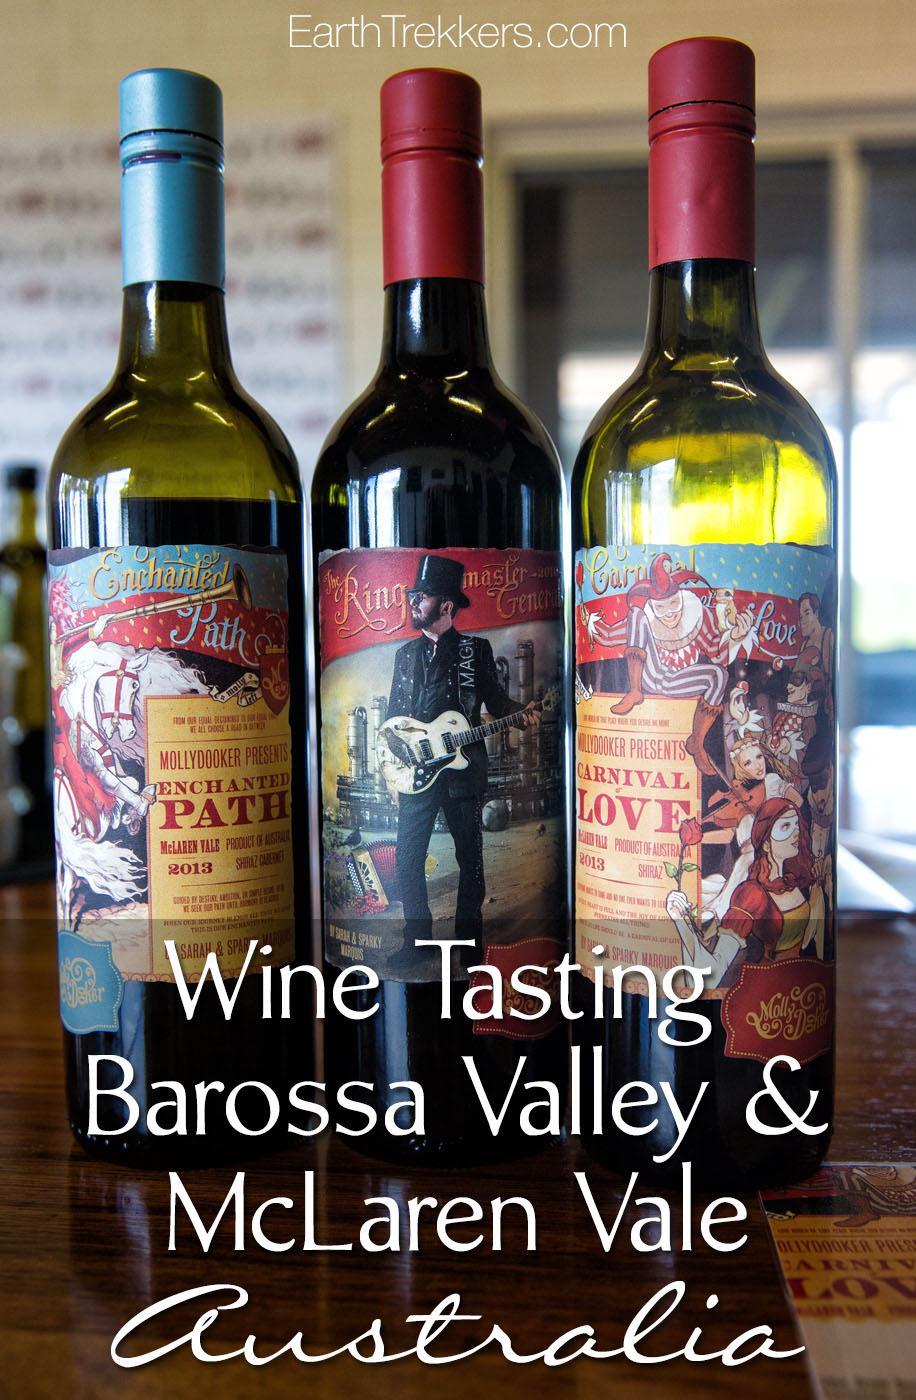 Barossa Valley Mclaren Vale wine tasting